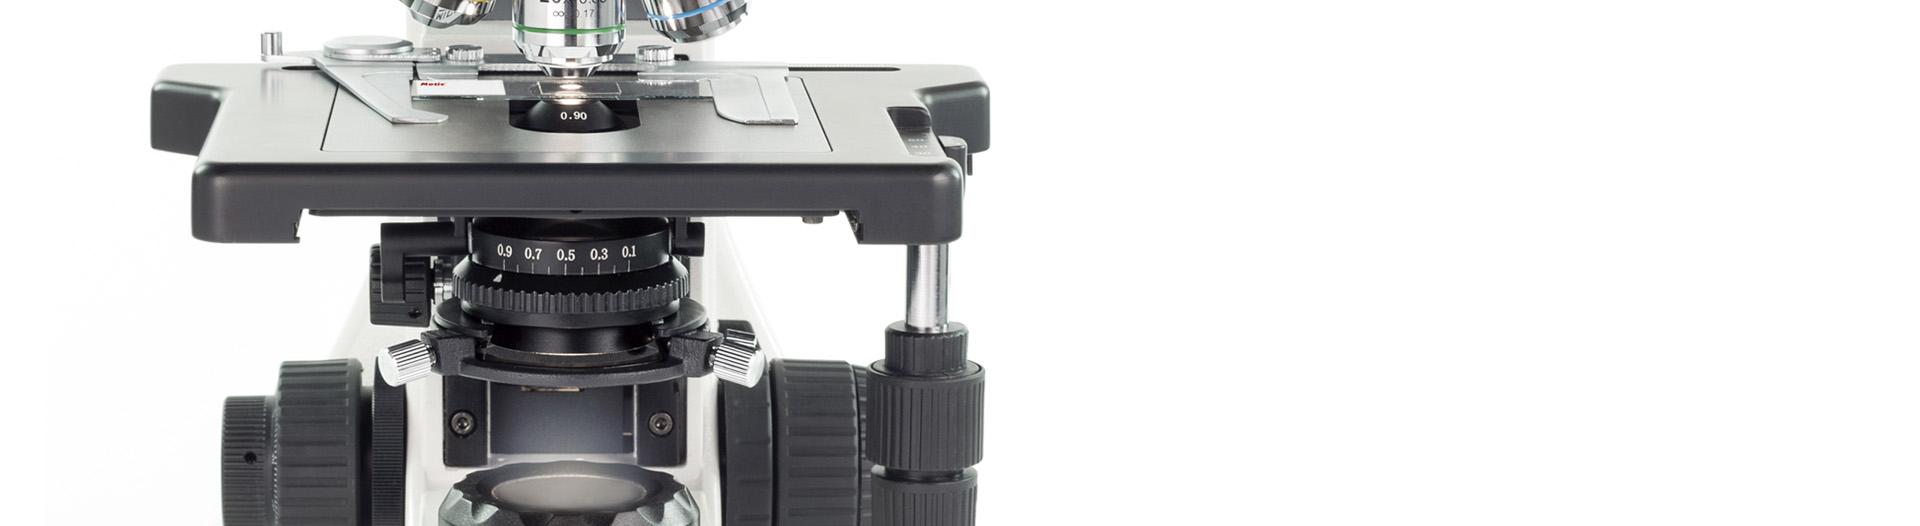 BA410E microscope Illumination